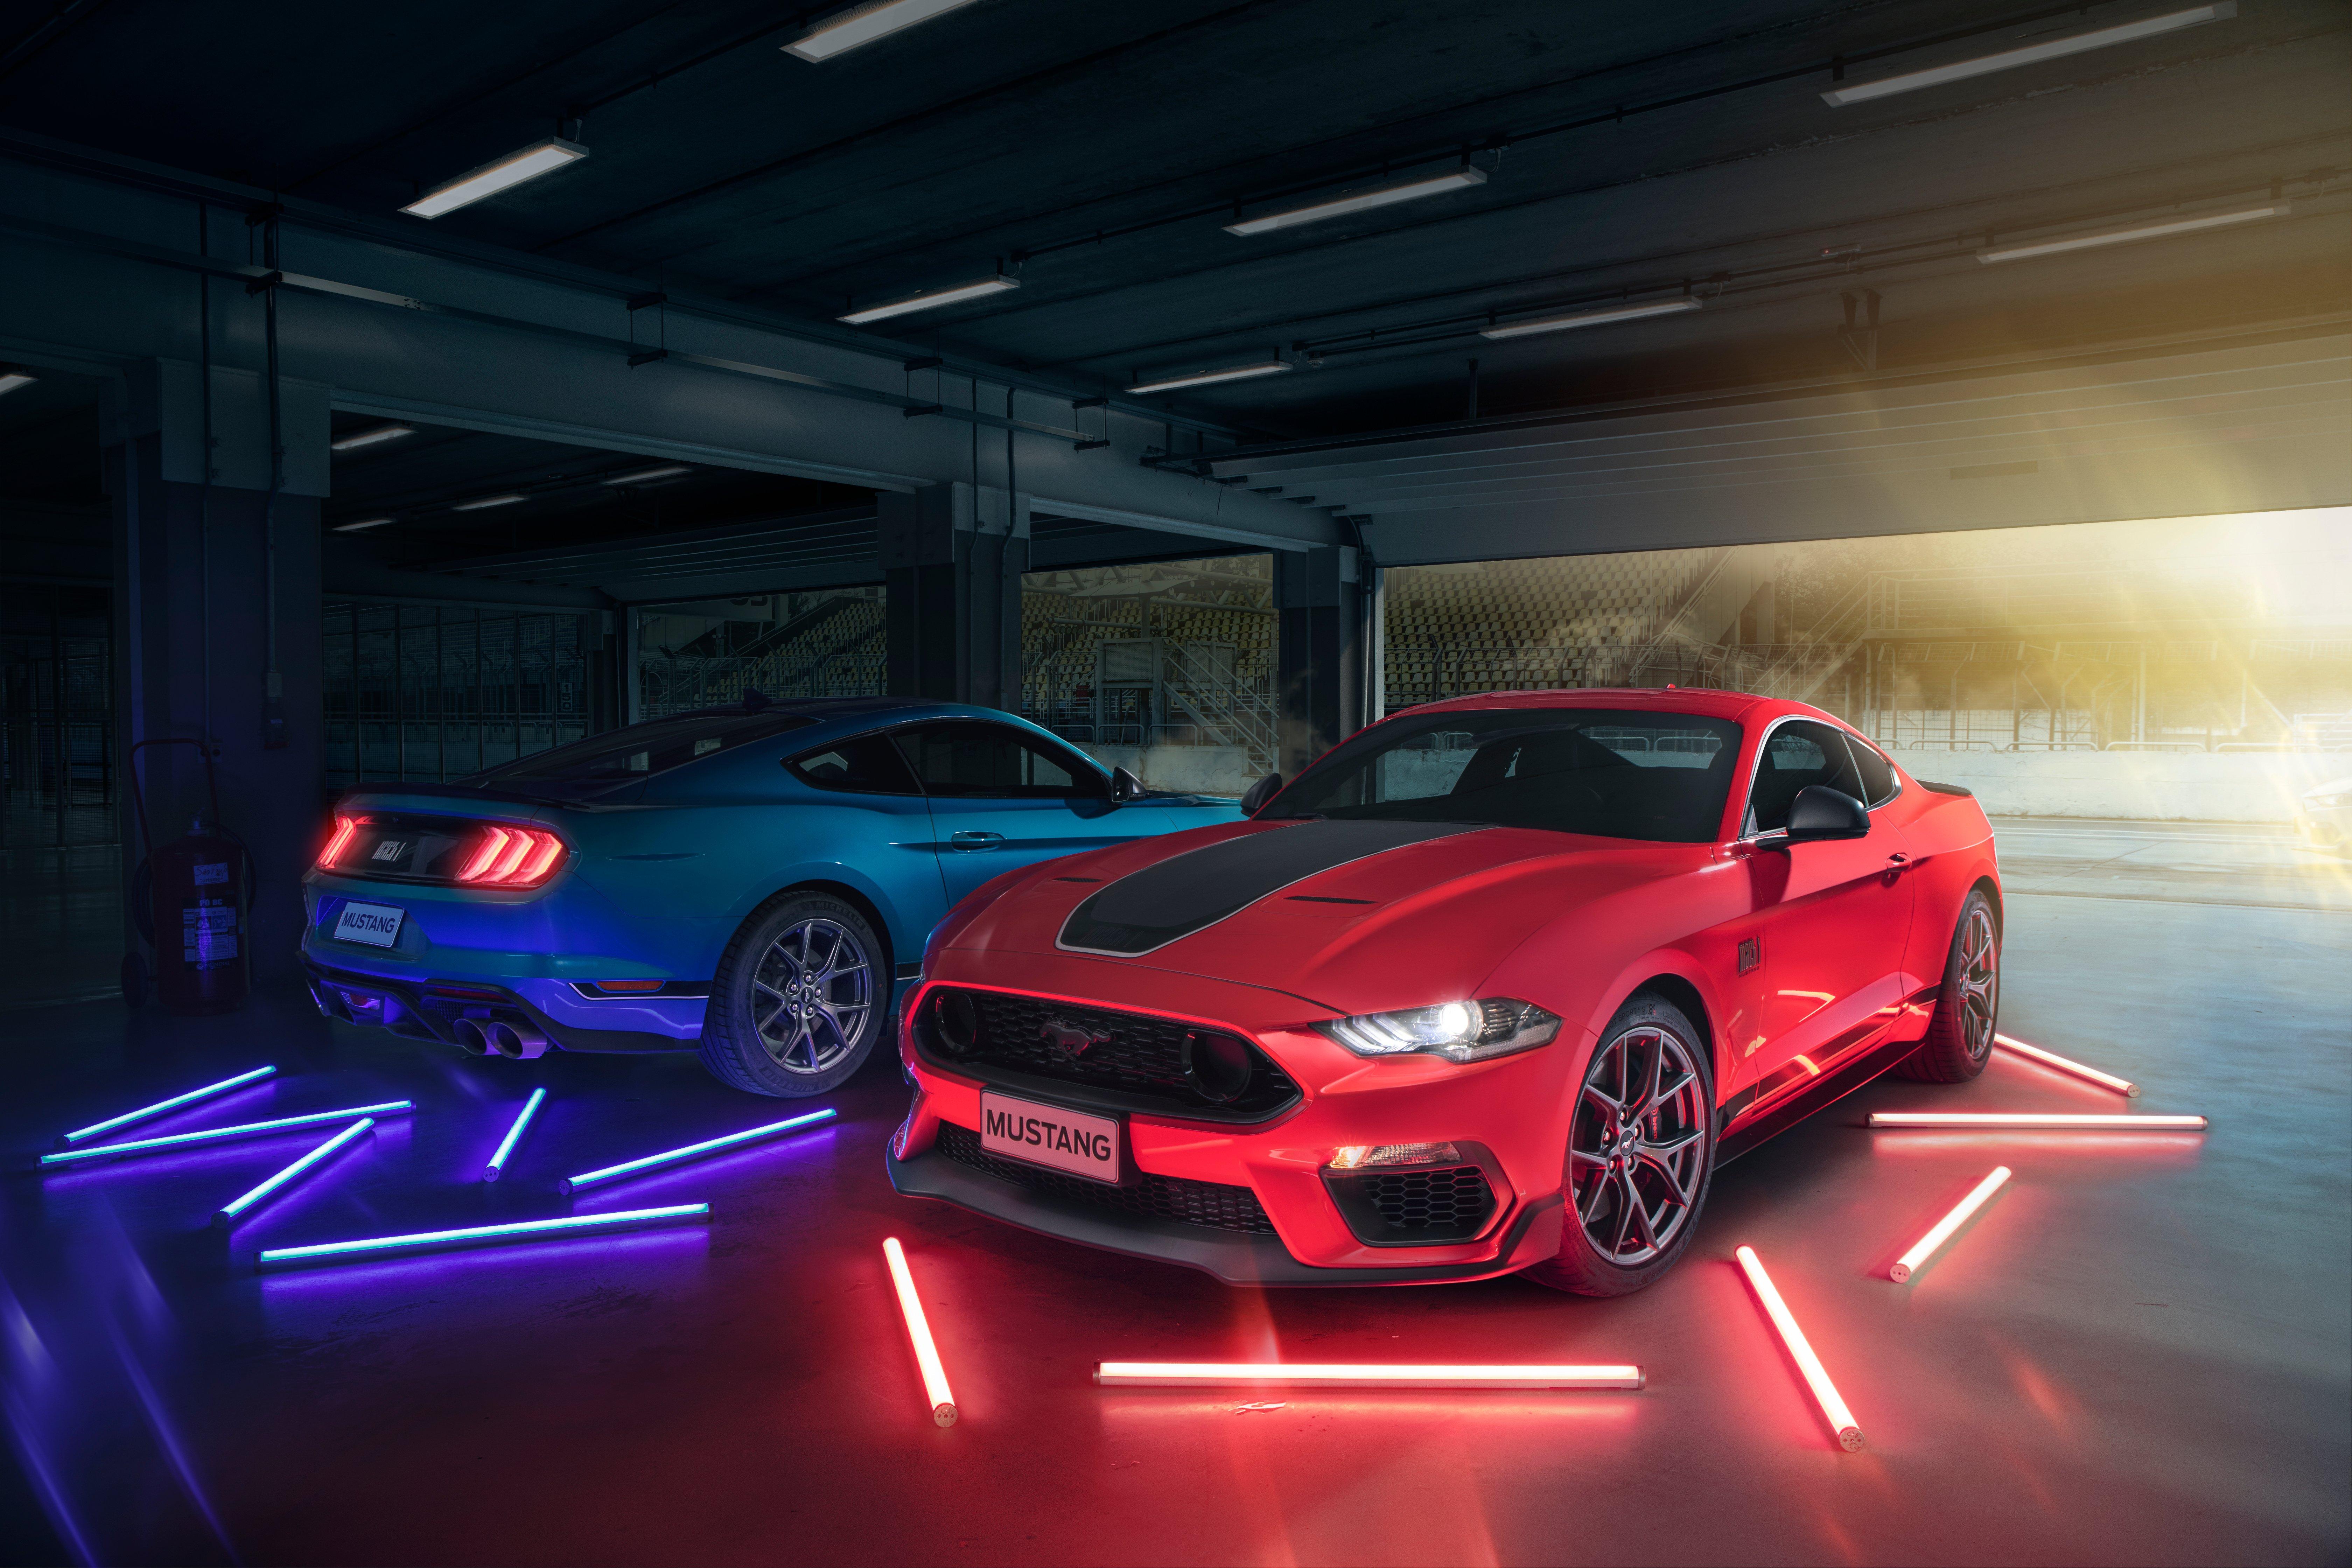 Fondos de pantalla Ford Mustang Mach 1